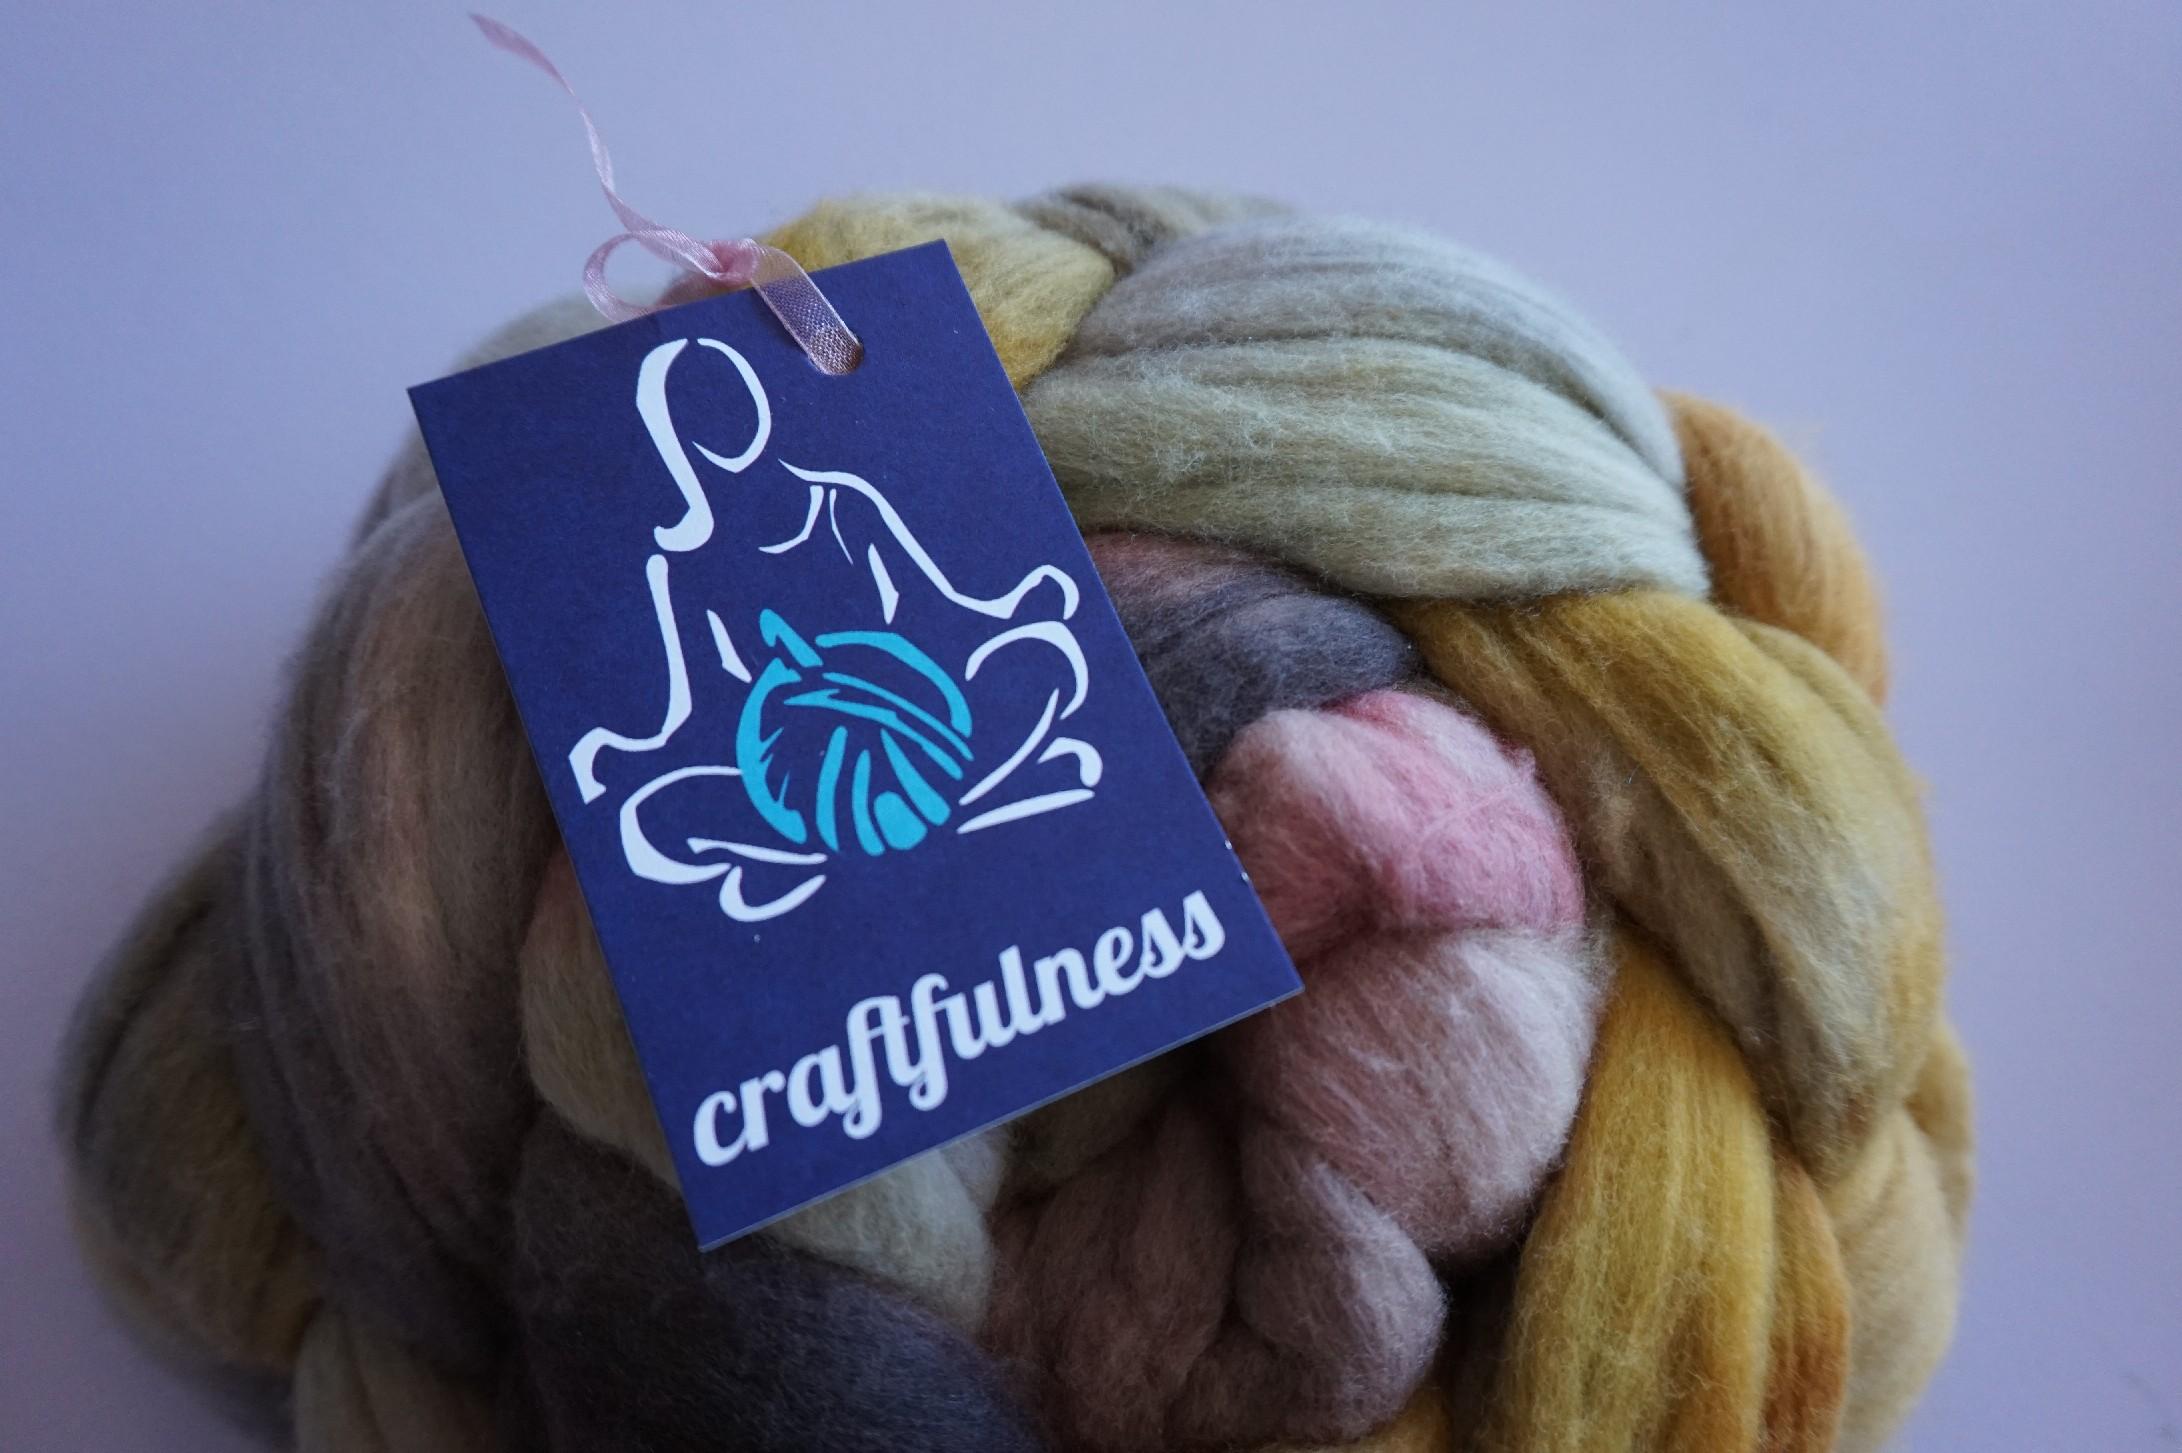 craftfulness01